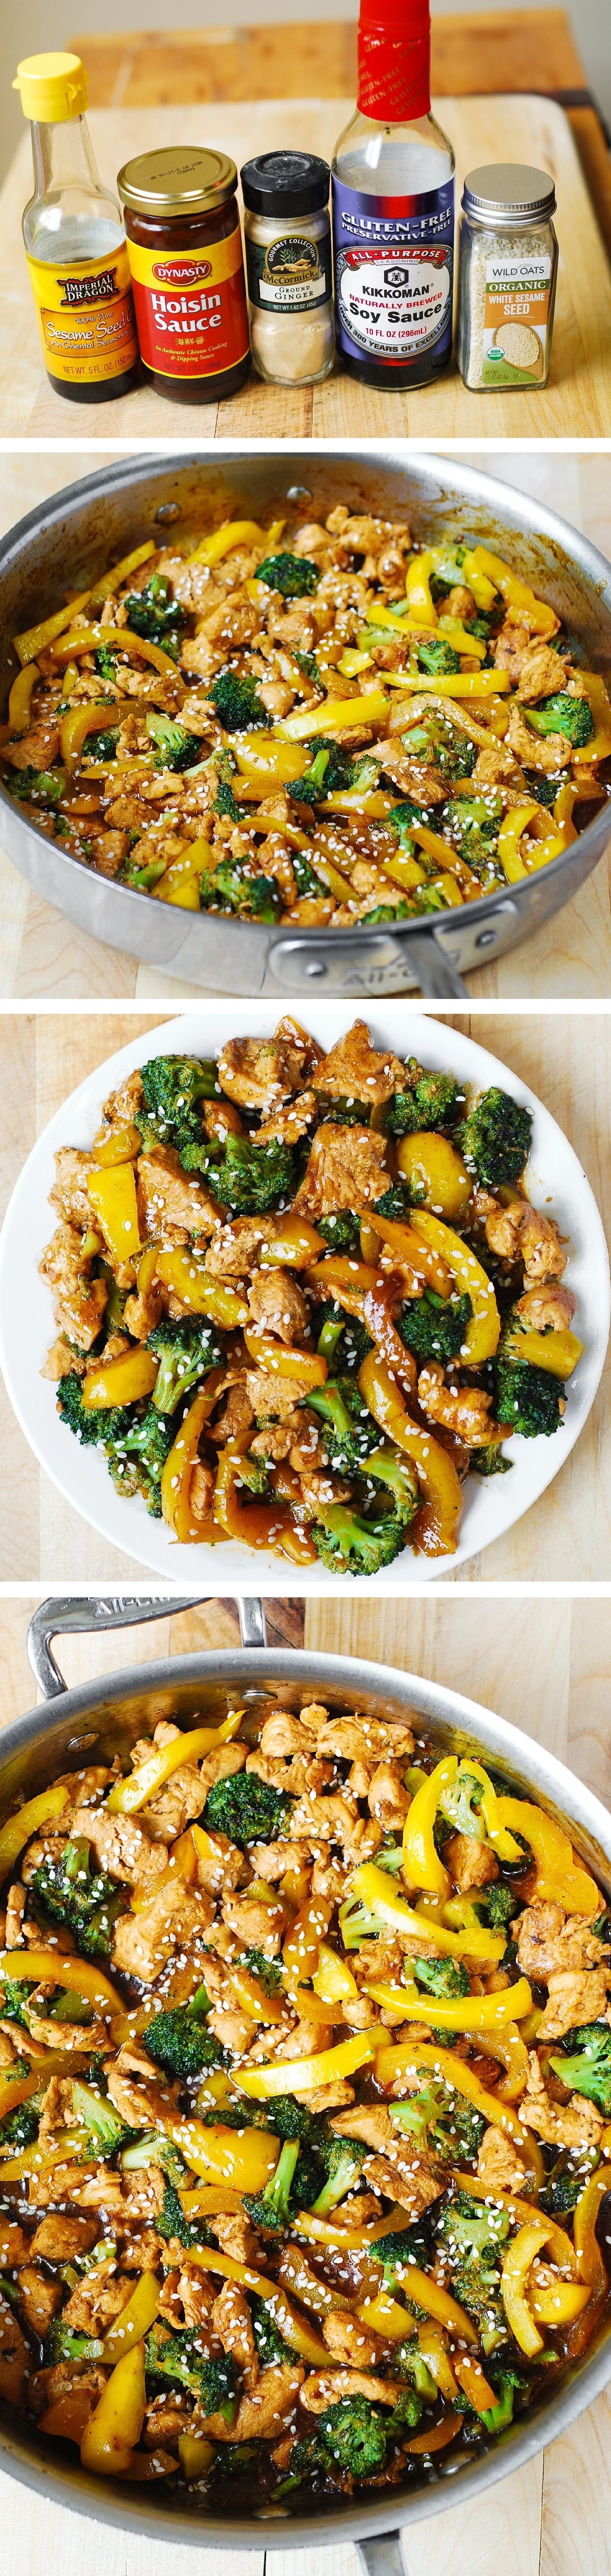 Chicken And Broccoli Stir-Fry  Recipe  Julias Dinner -6264